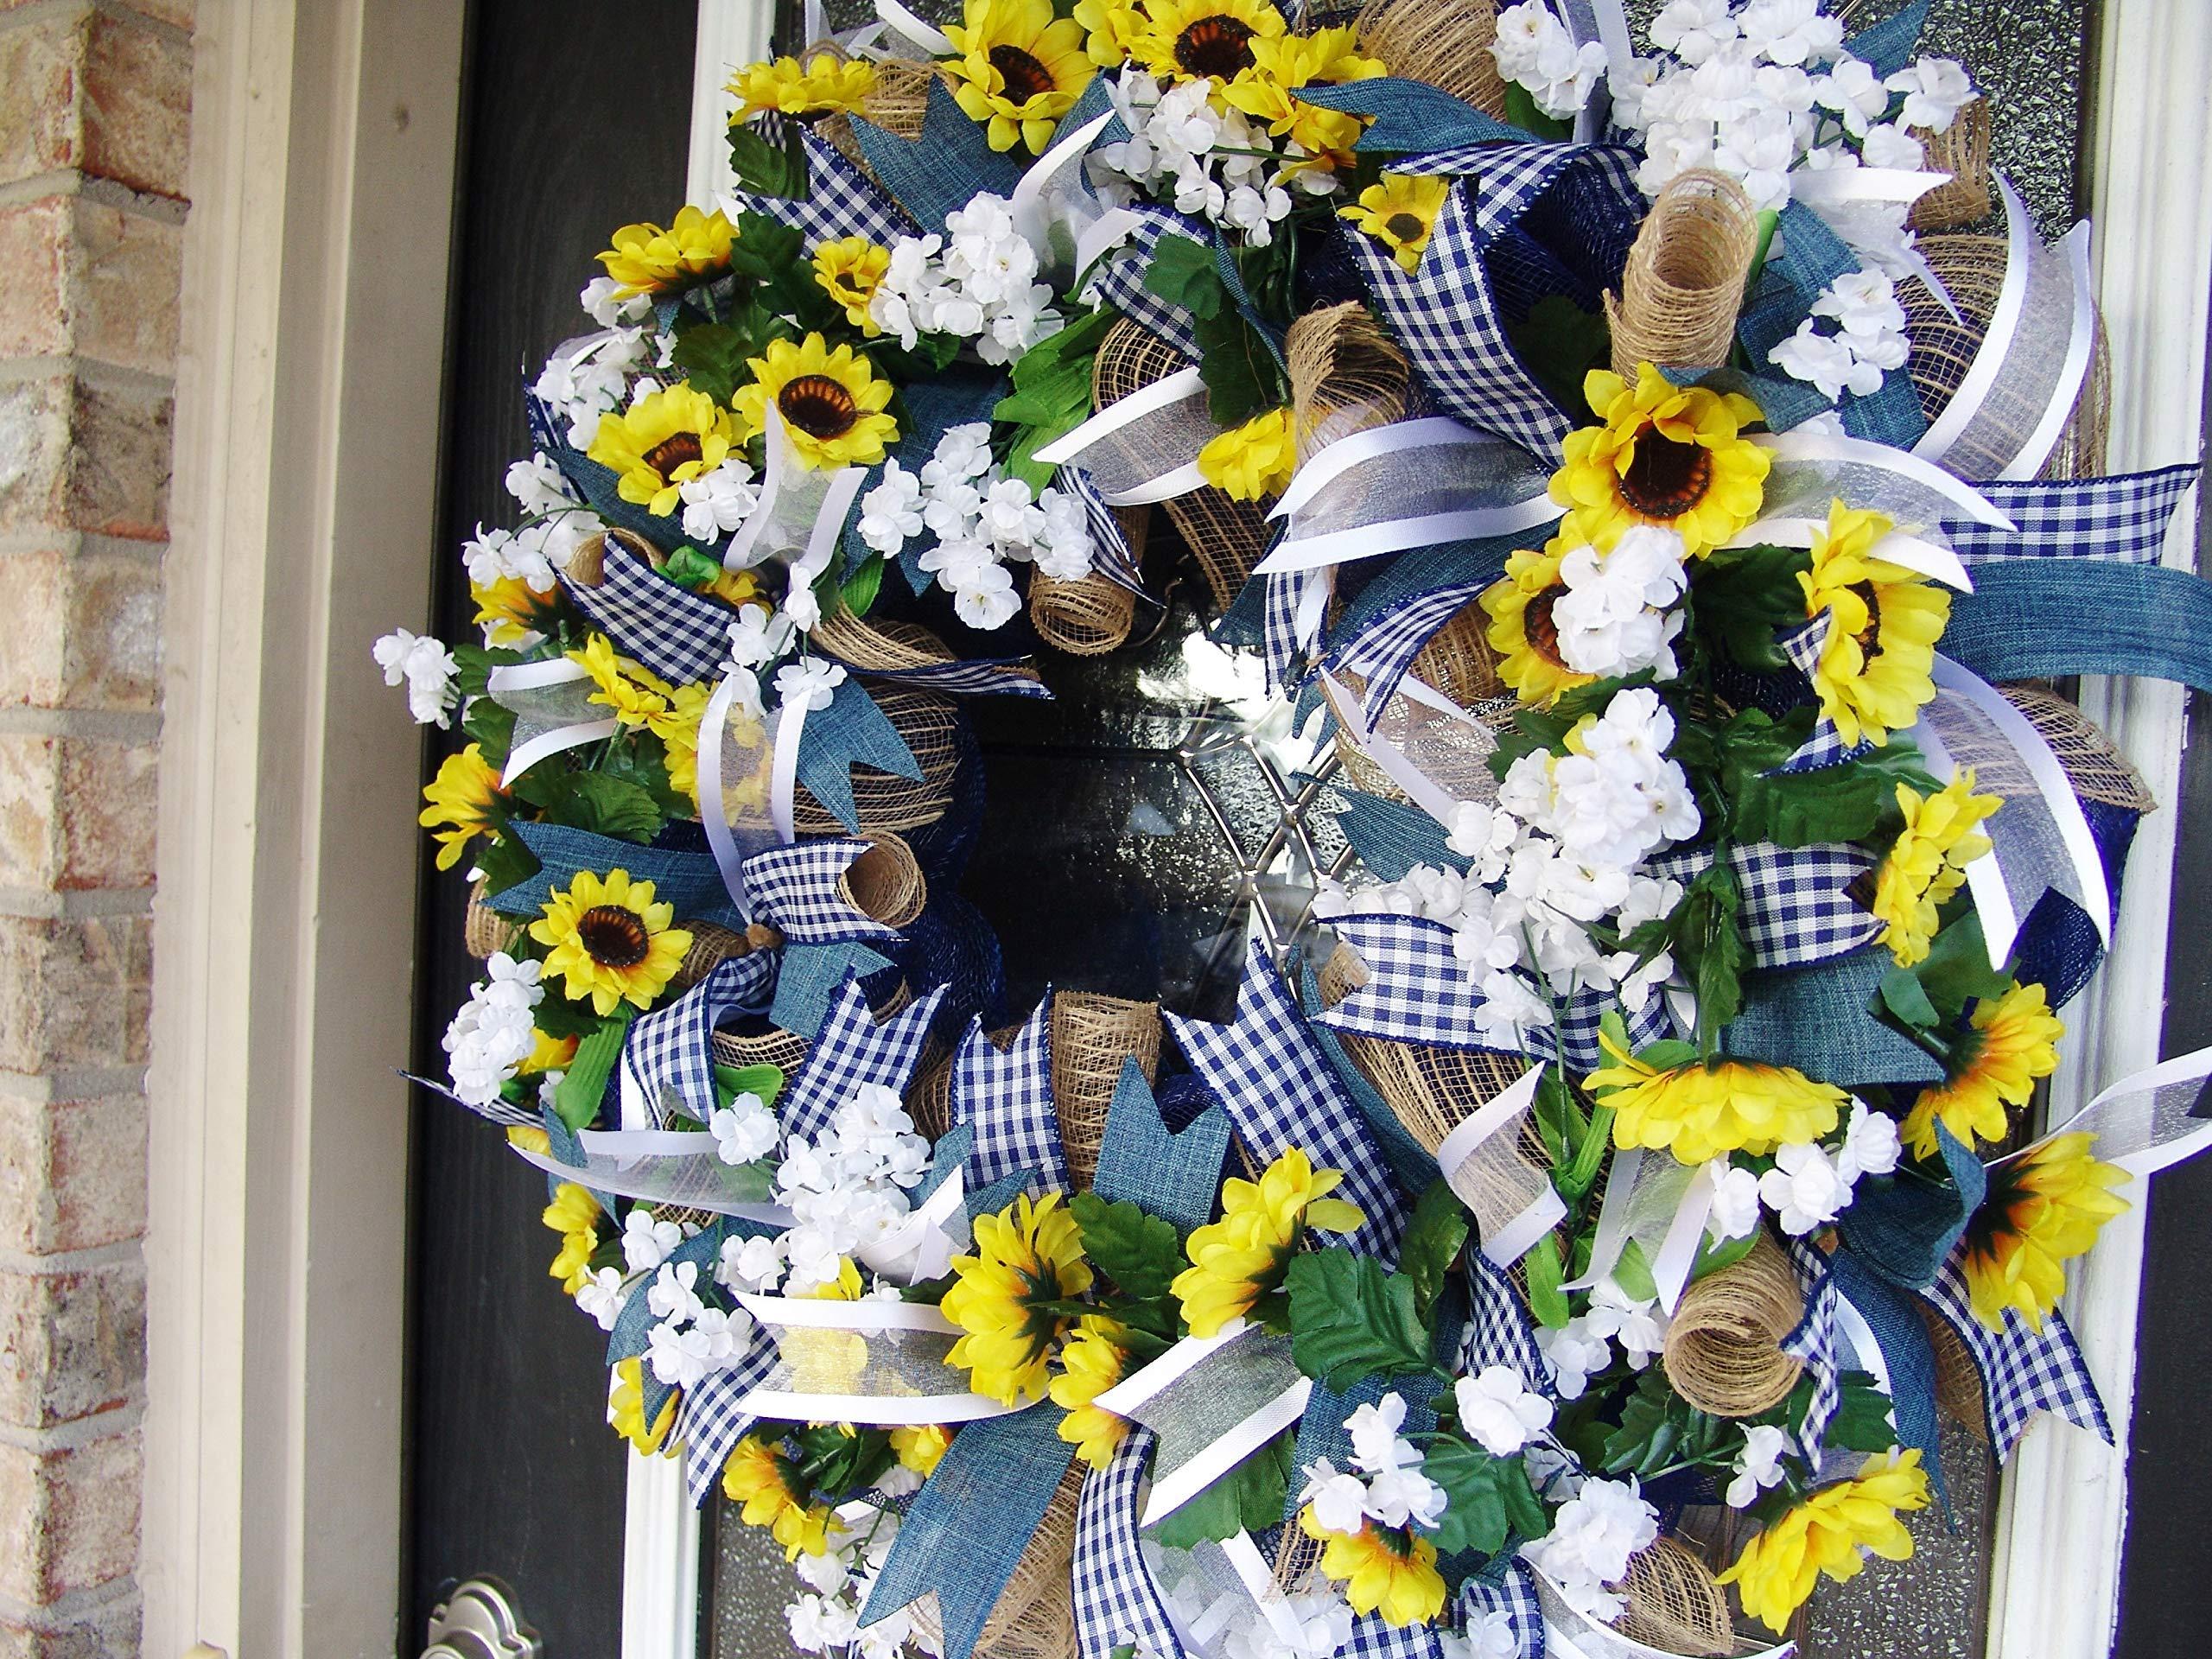 Country-Blue-Sunflower-Wreath-Decor-Fall-Spring-Summer-Front-Door-Burlap-Wedding-Farmhouse-Decor-French-Country-Decor